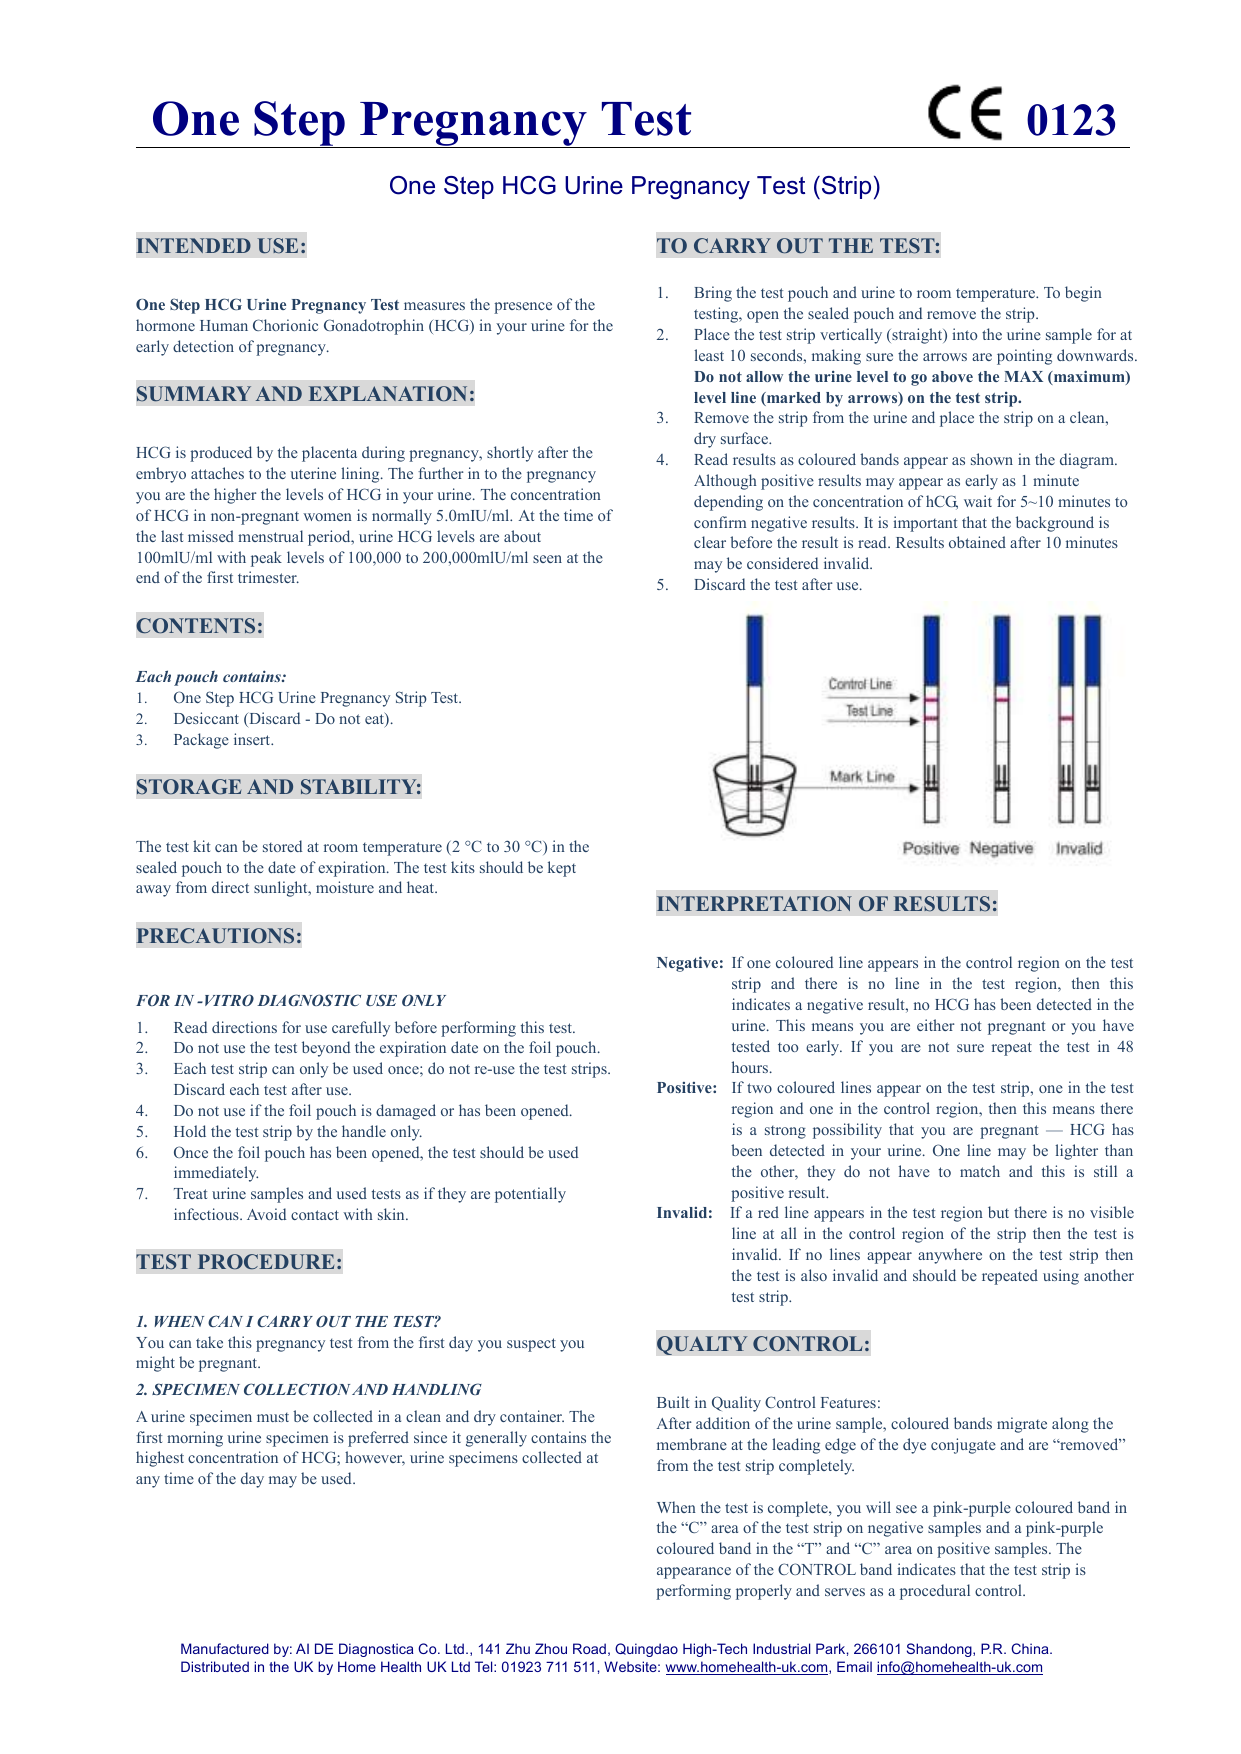 One Step HCG Urine Pregnancy Test (Strip) 019